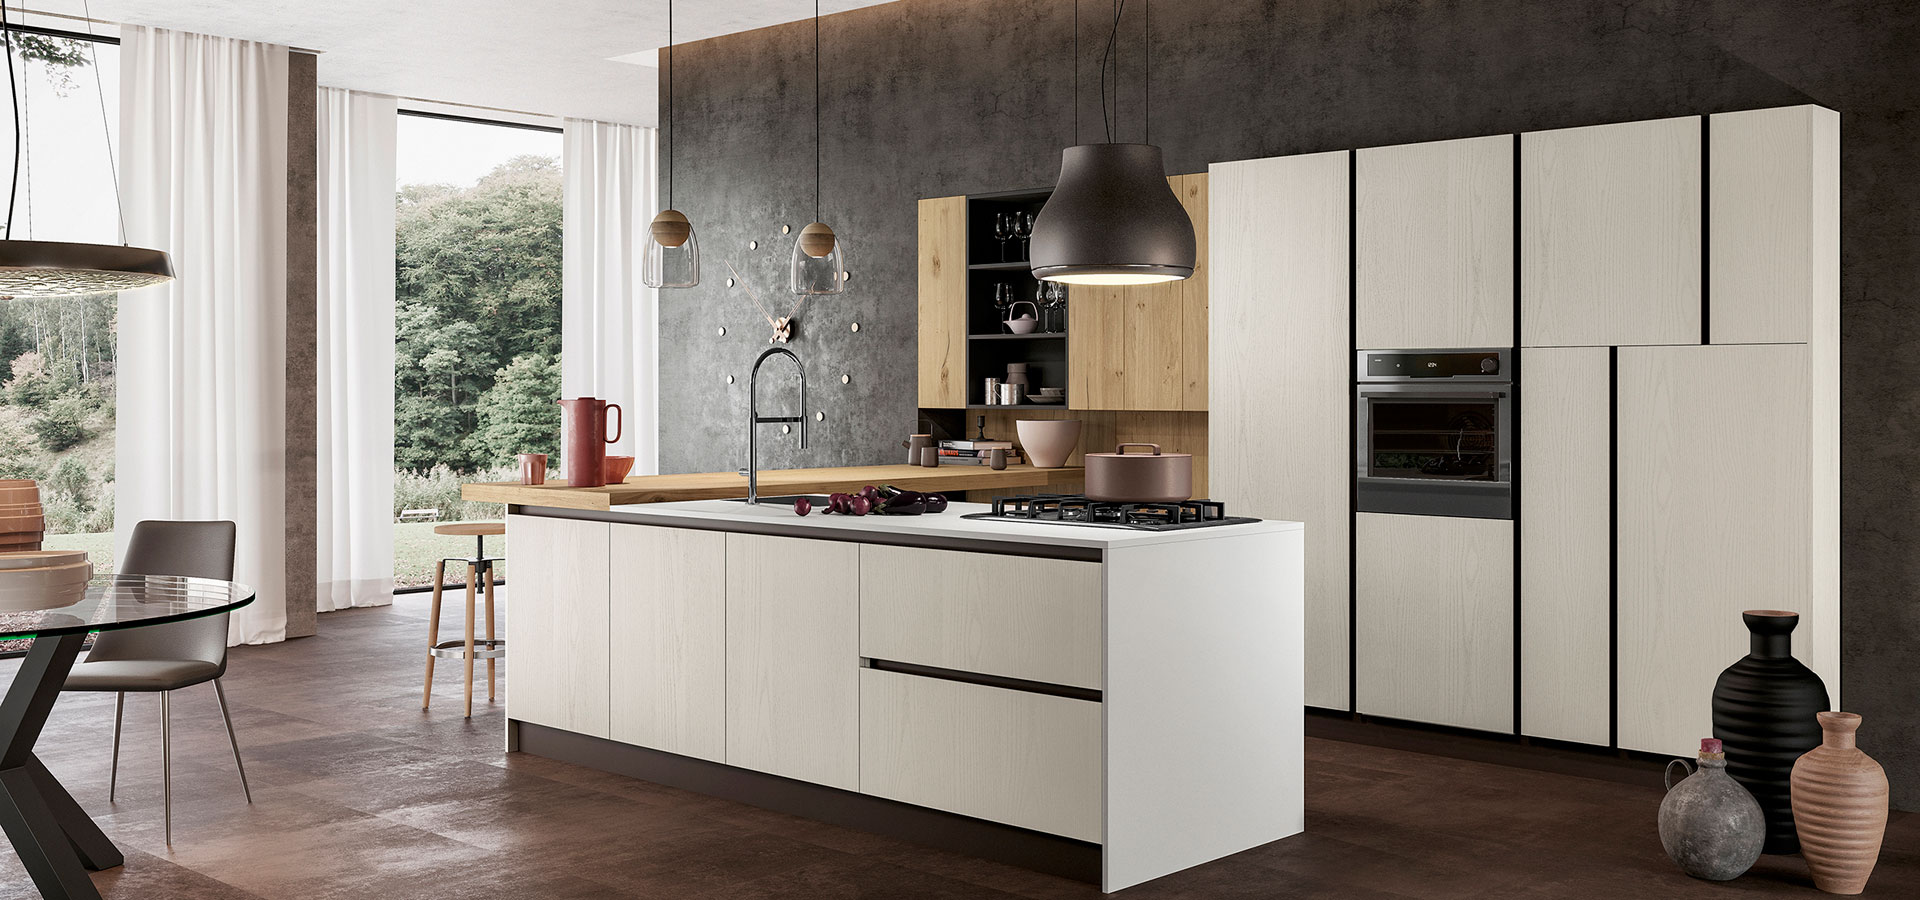 Cucine moderne arredo3 i 5 modelli da non perdere blog - Ambientazioni cucine moderne ...